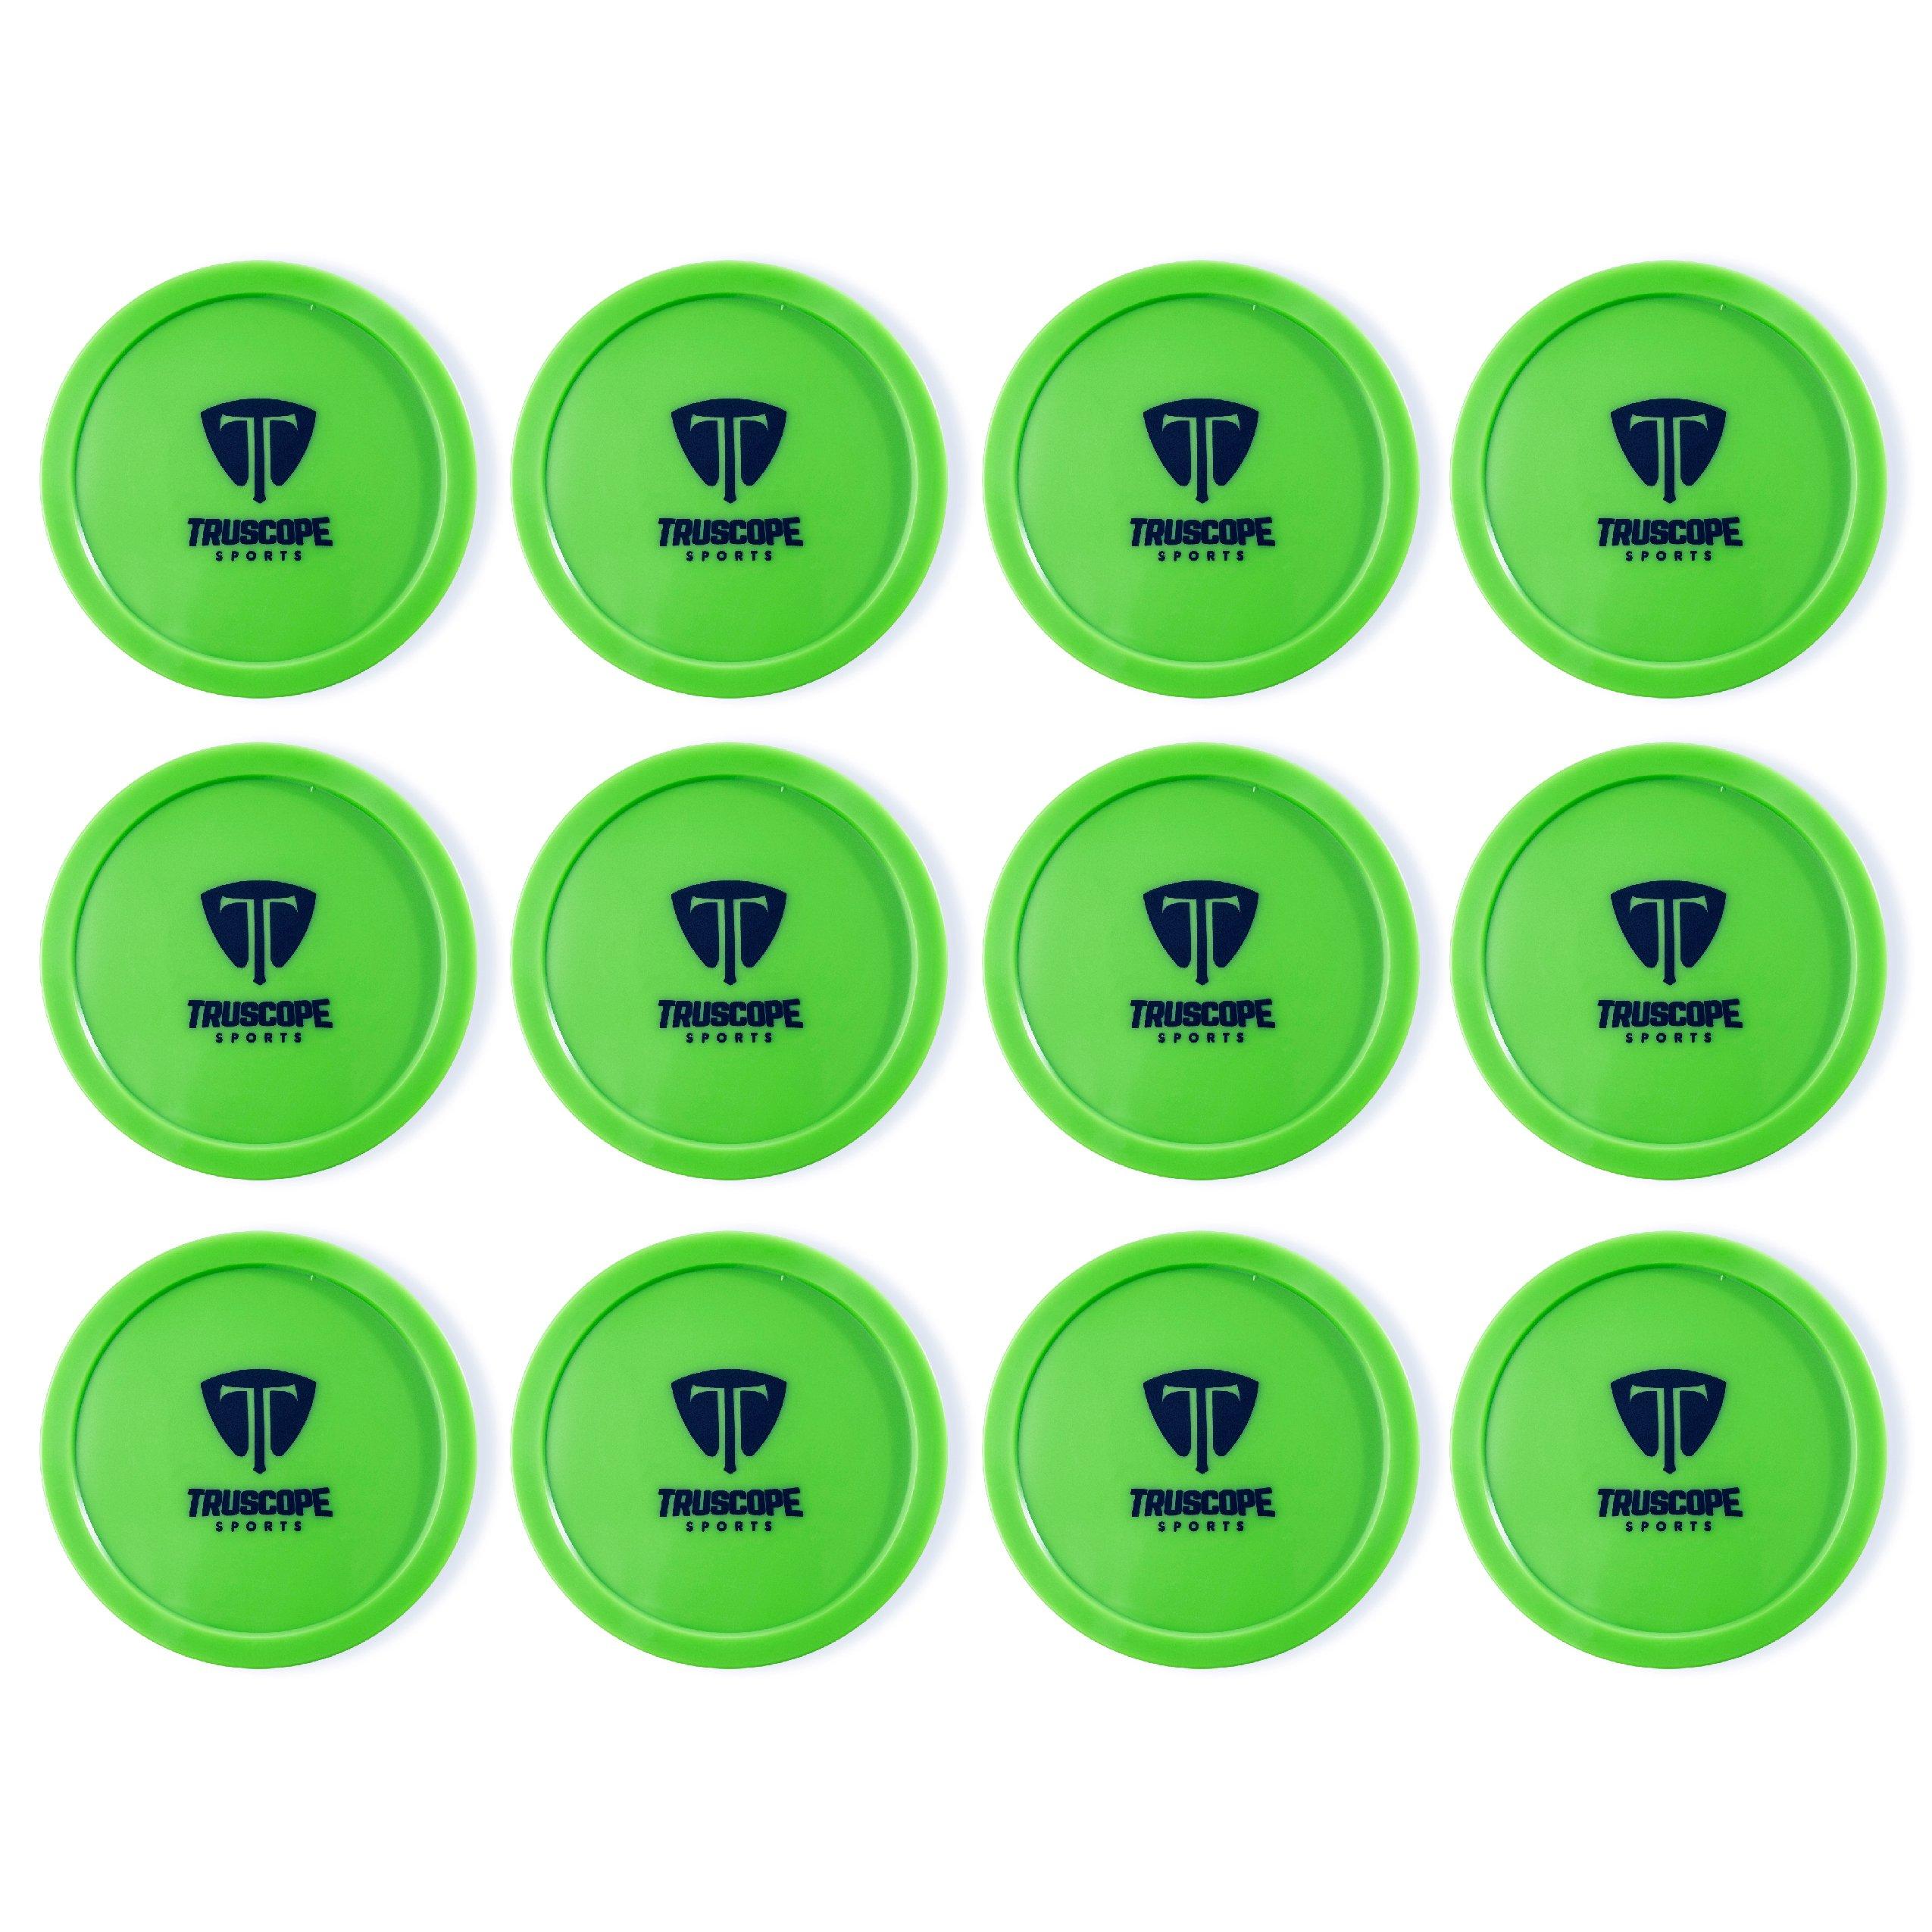 Truscope Sports 12 Pack 3 1/4 Inch Air Hockey Pucks (Green)